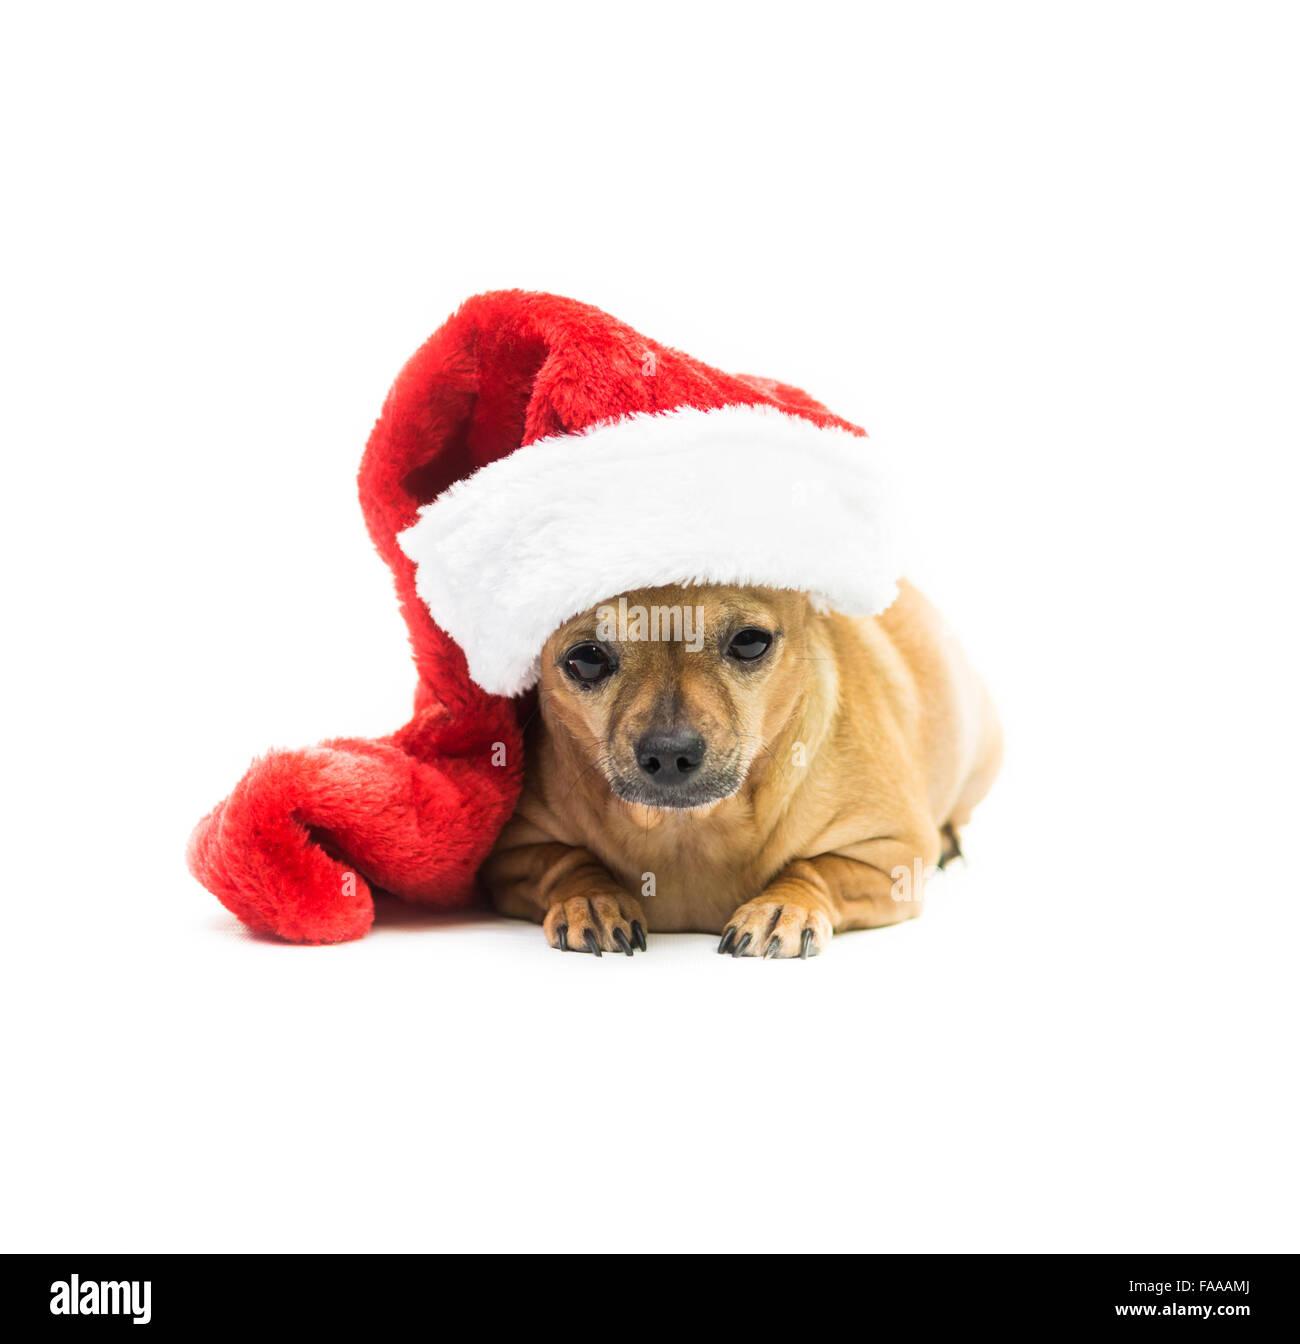 Chihuahua Dog Wearing Christmas Stocking - center - Stock Image